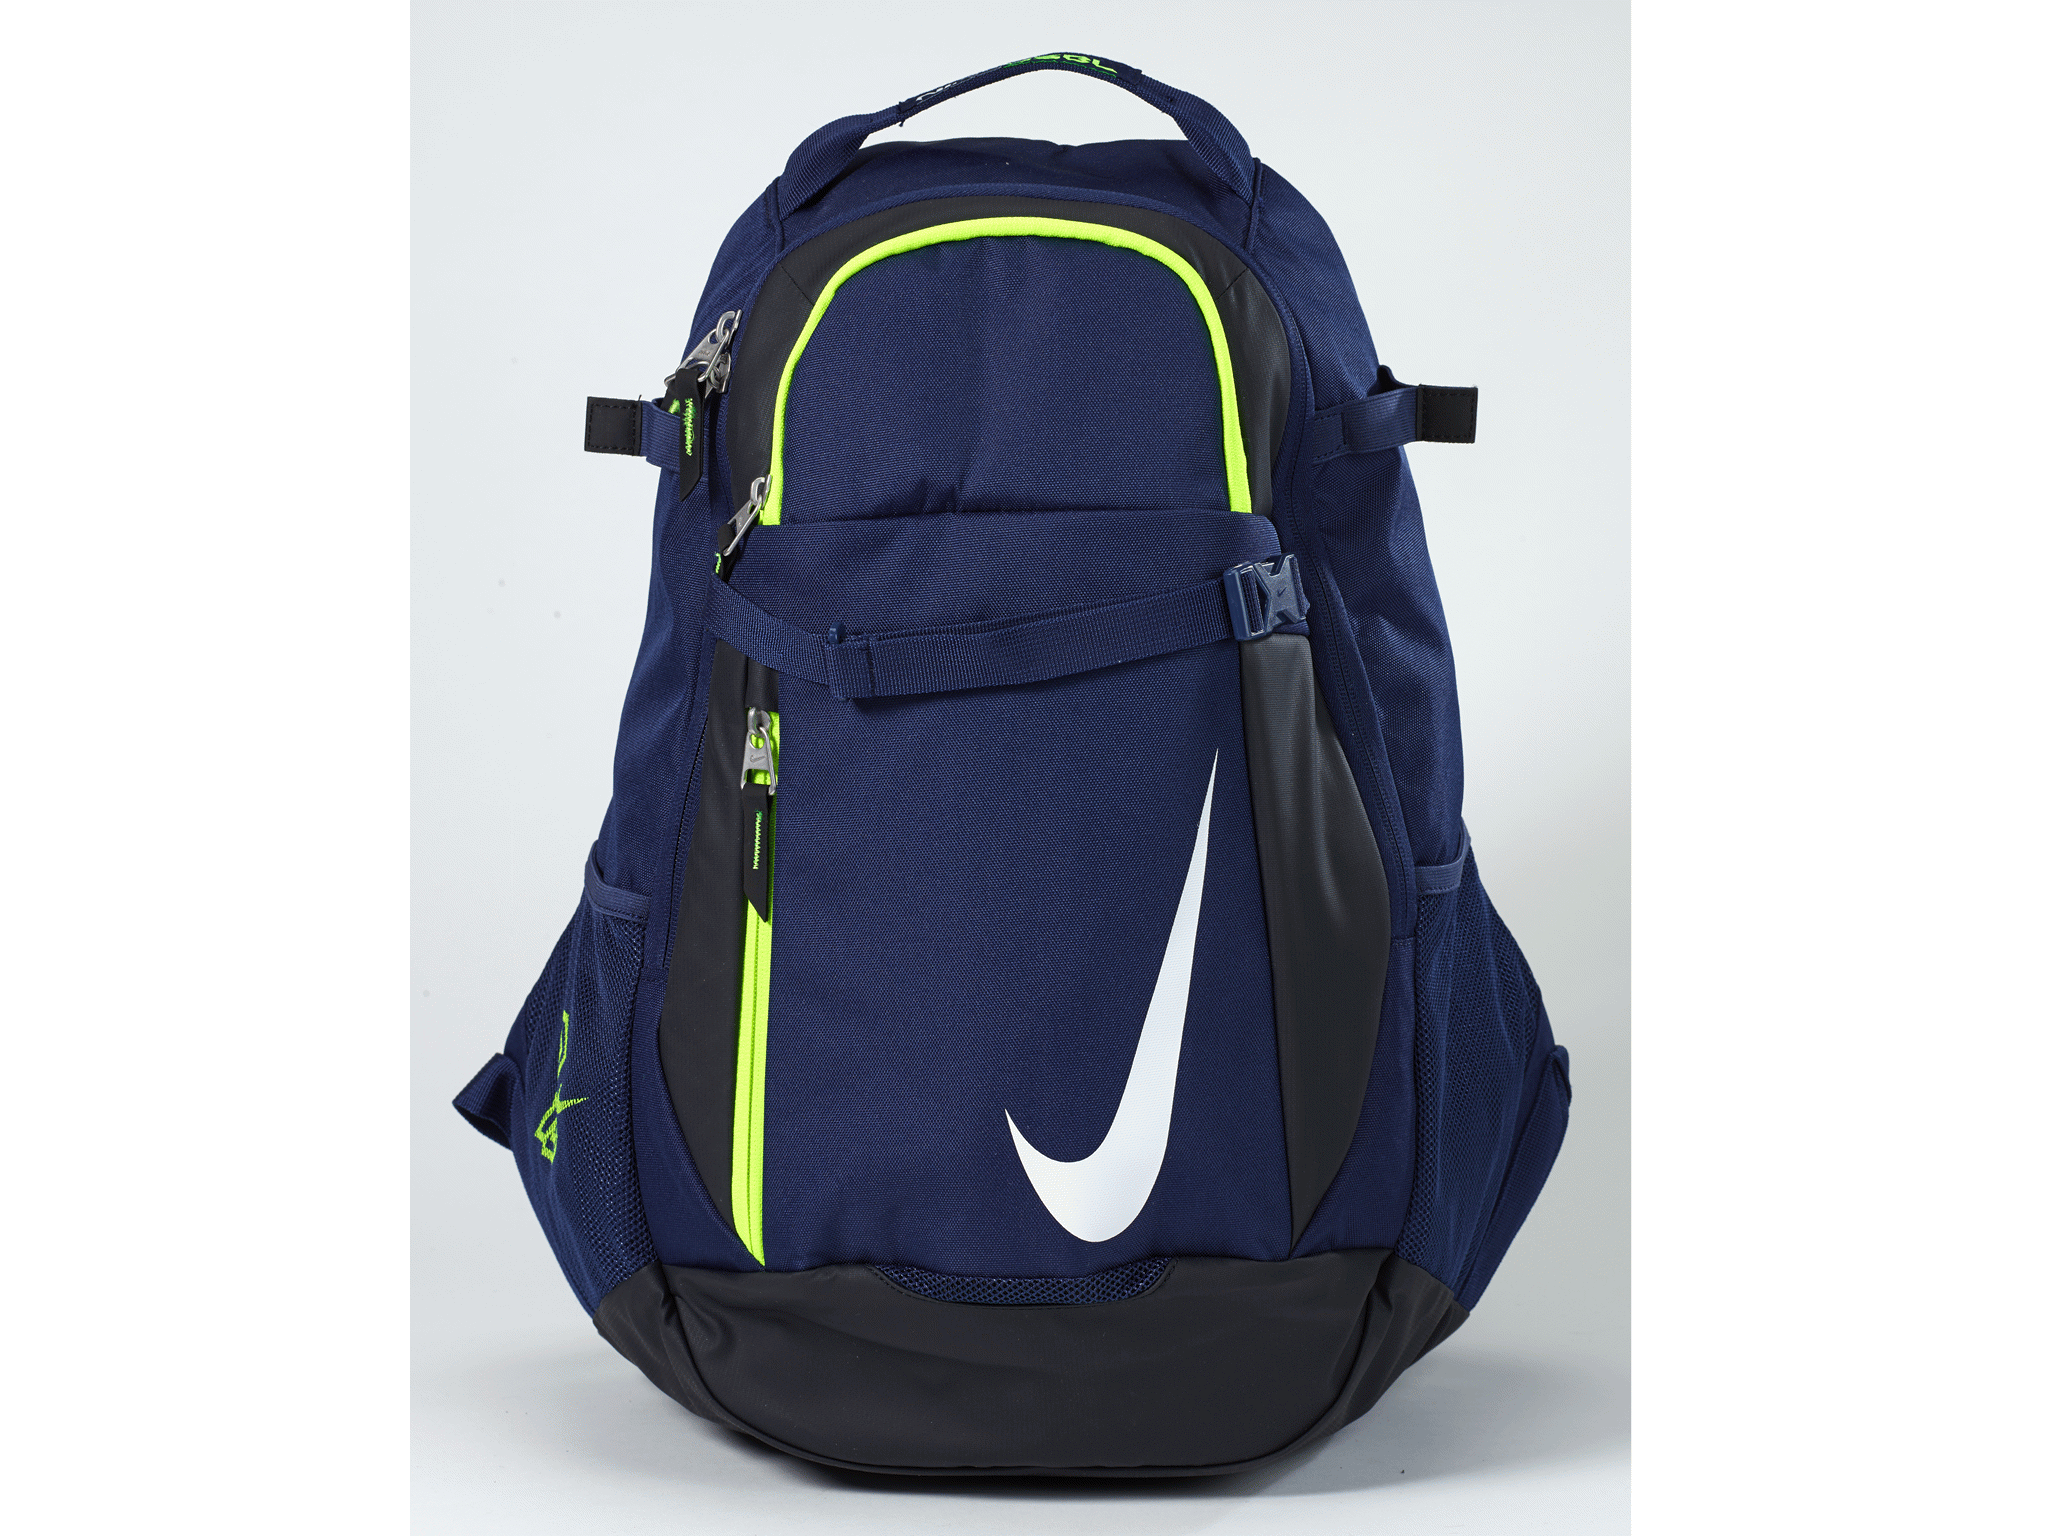 Backpacks | Meijer.com